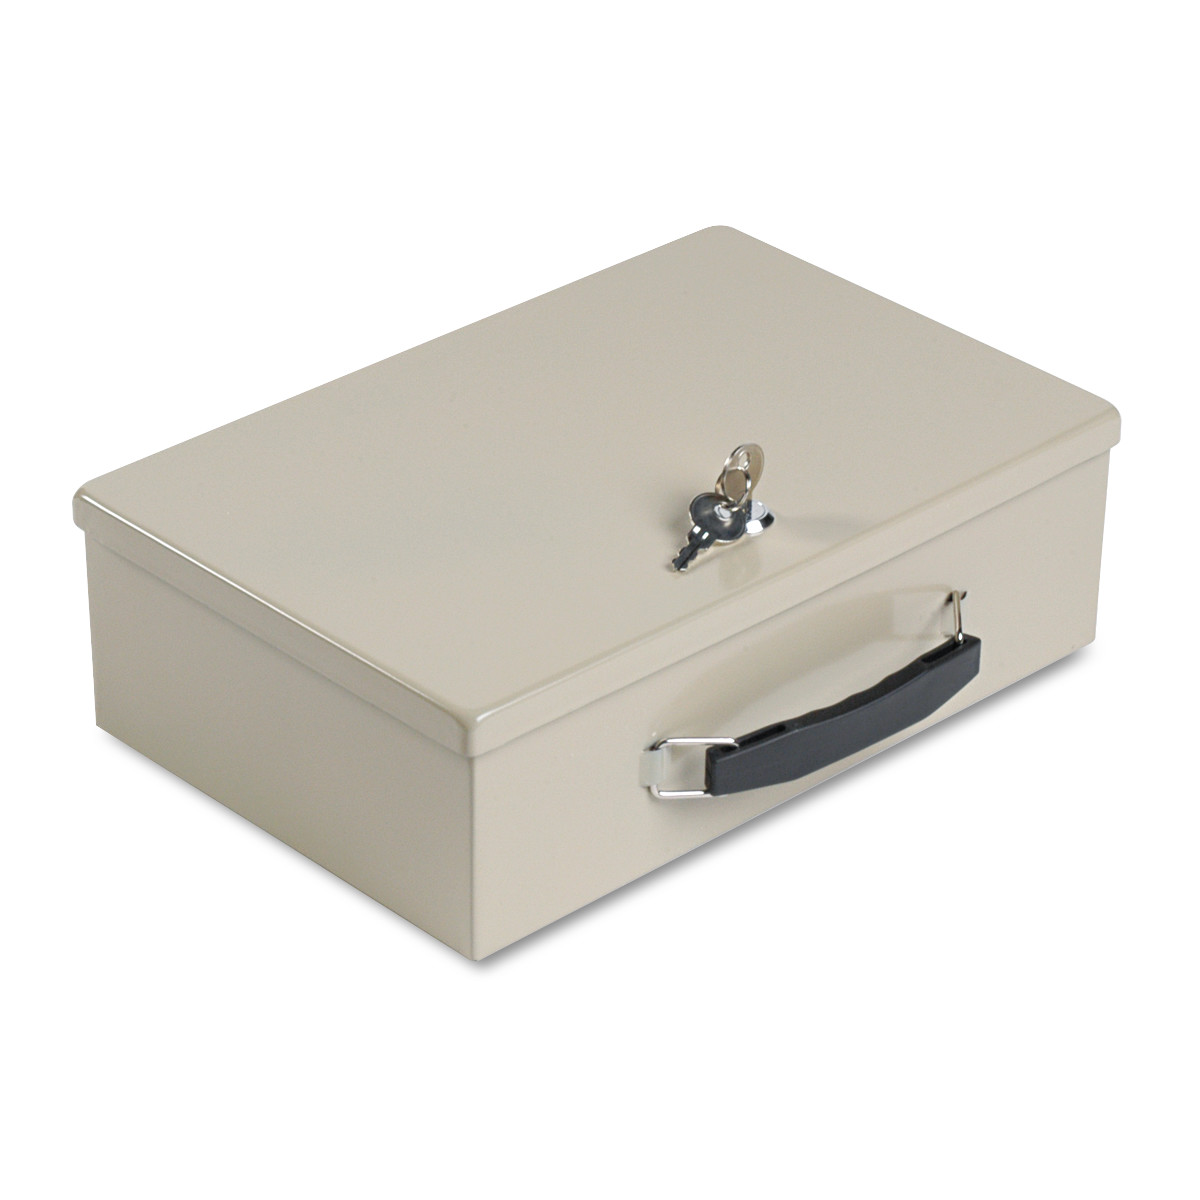 SteelMaster Heavy-Duty Steel Fire-Retardant Security Cash Box, Key Lock, Sand -MMF221614003